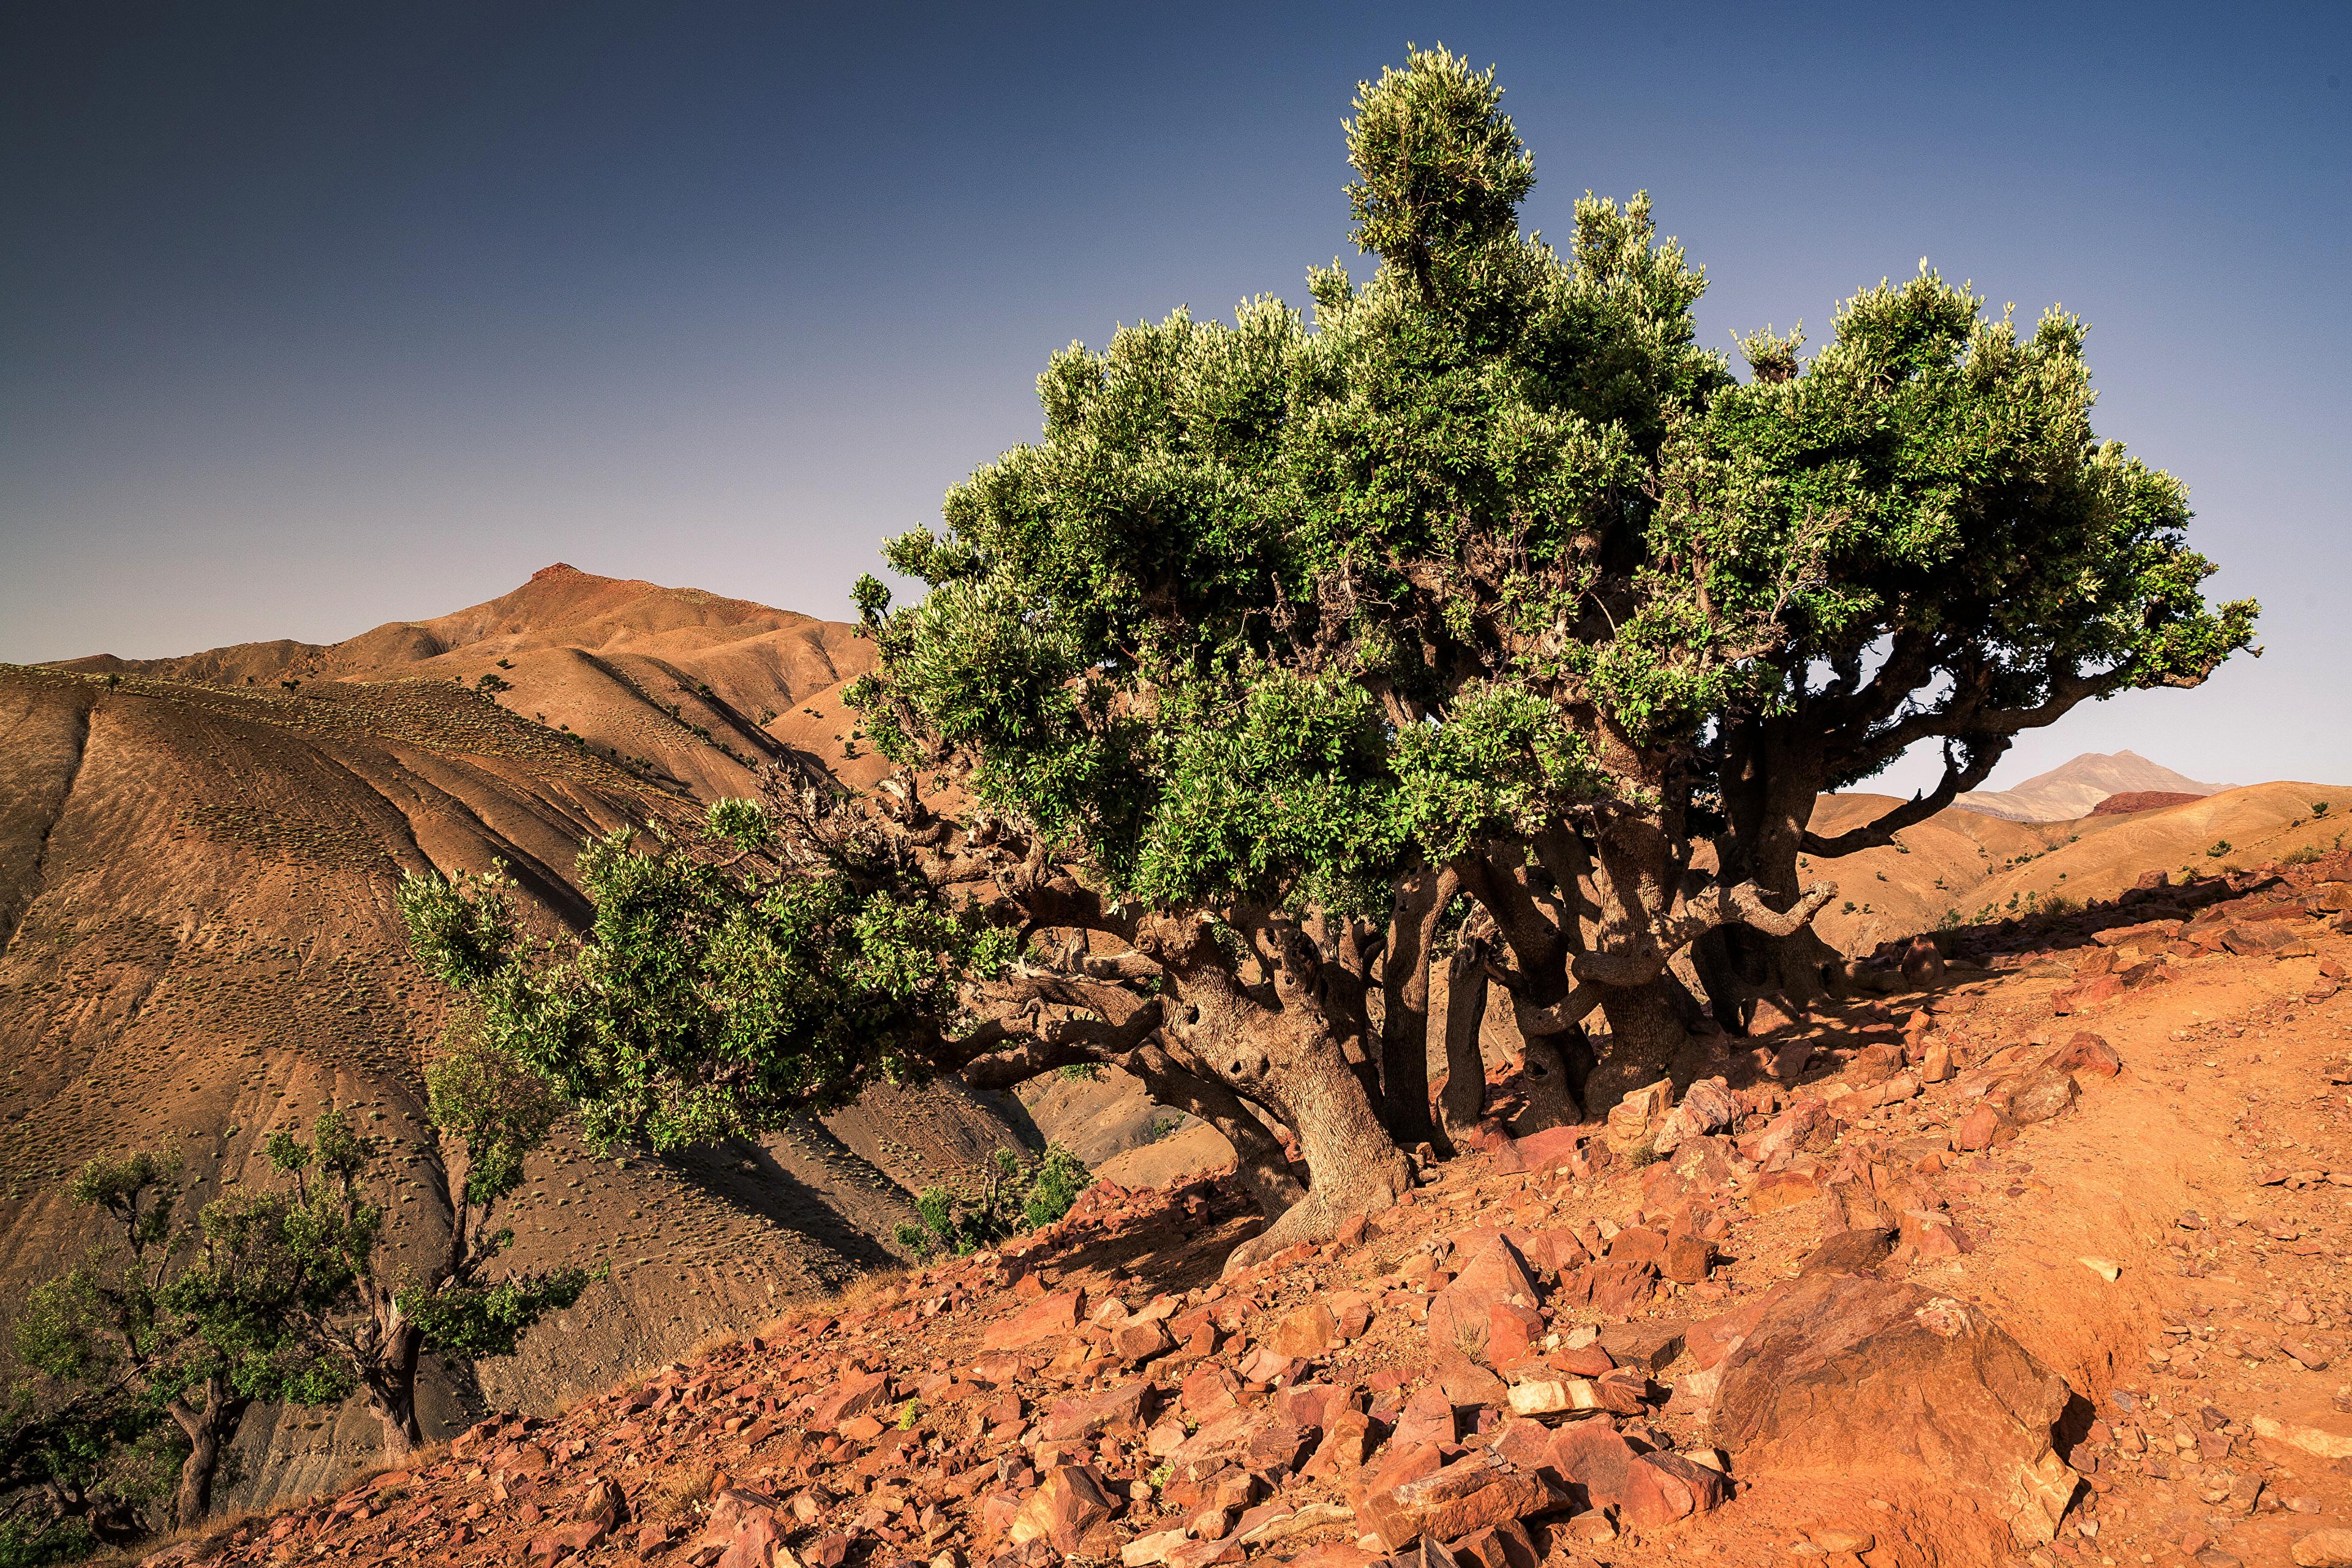 Картинка Африка Марокко Toufrine, Tadla-Azilal Природа Камень дерева 3840x2560 Камни дерево Деревья деревьев